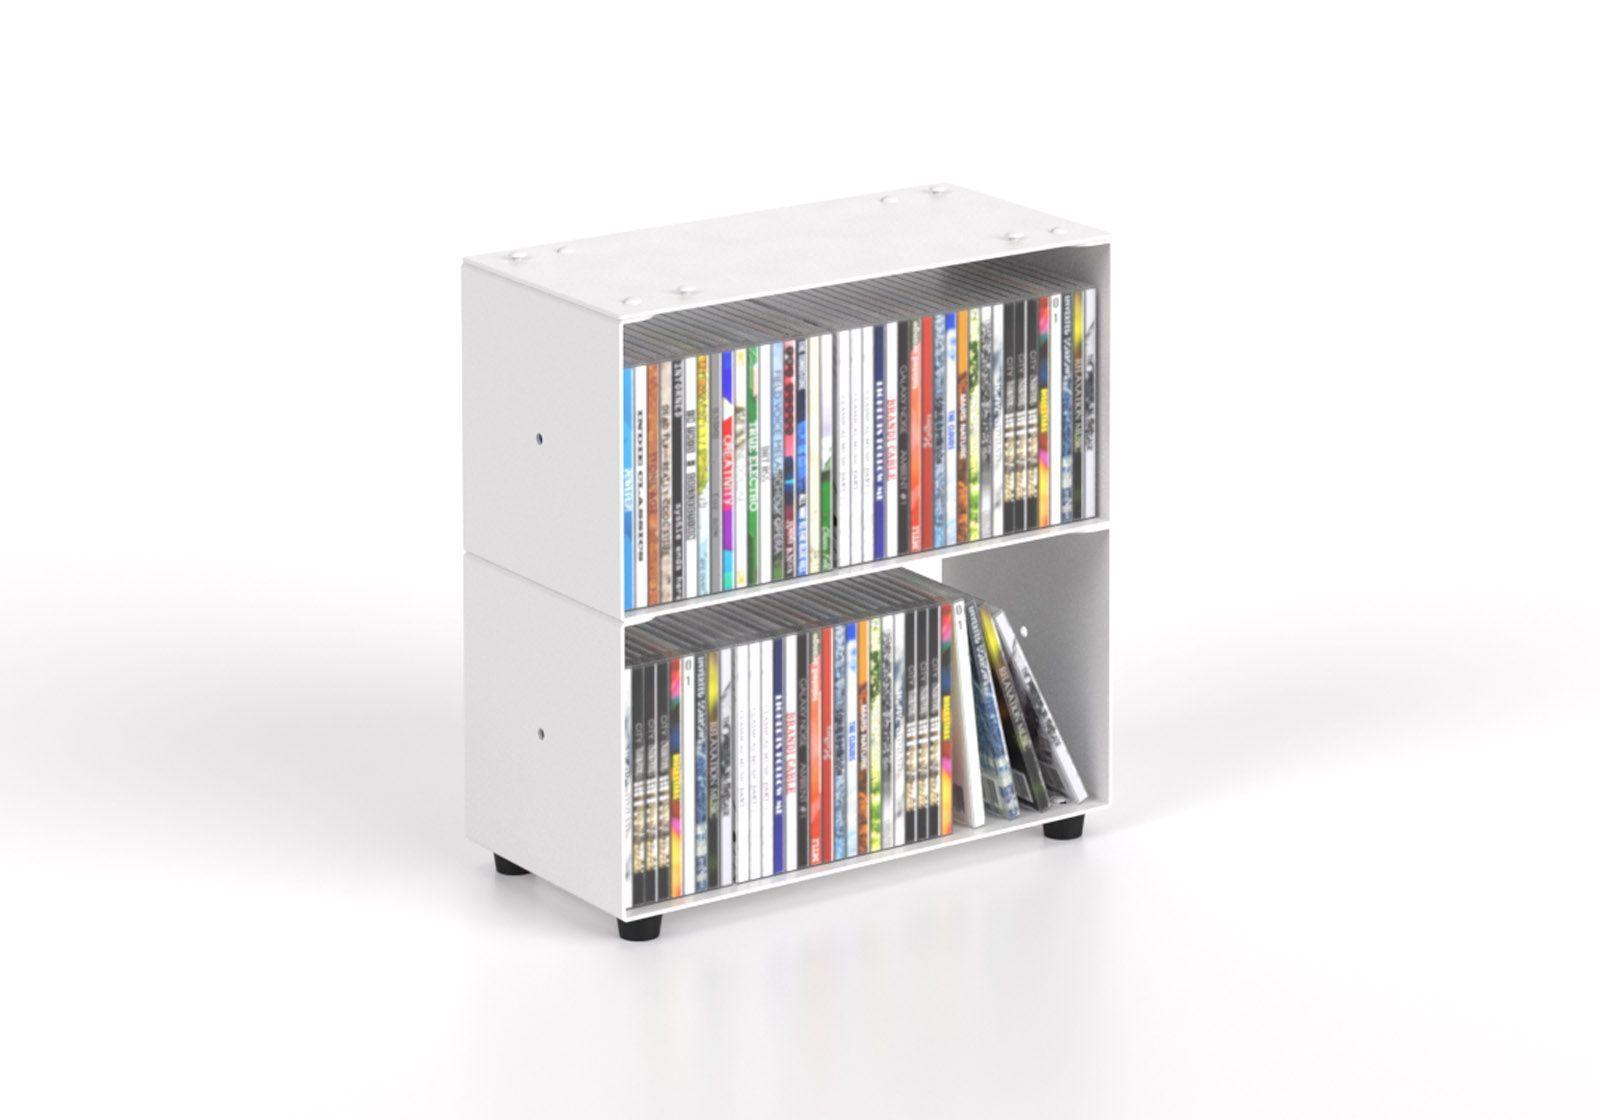 Cd storage W30 H30 D15 cm - 2 shelves